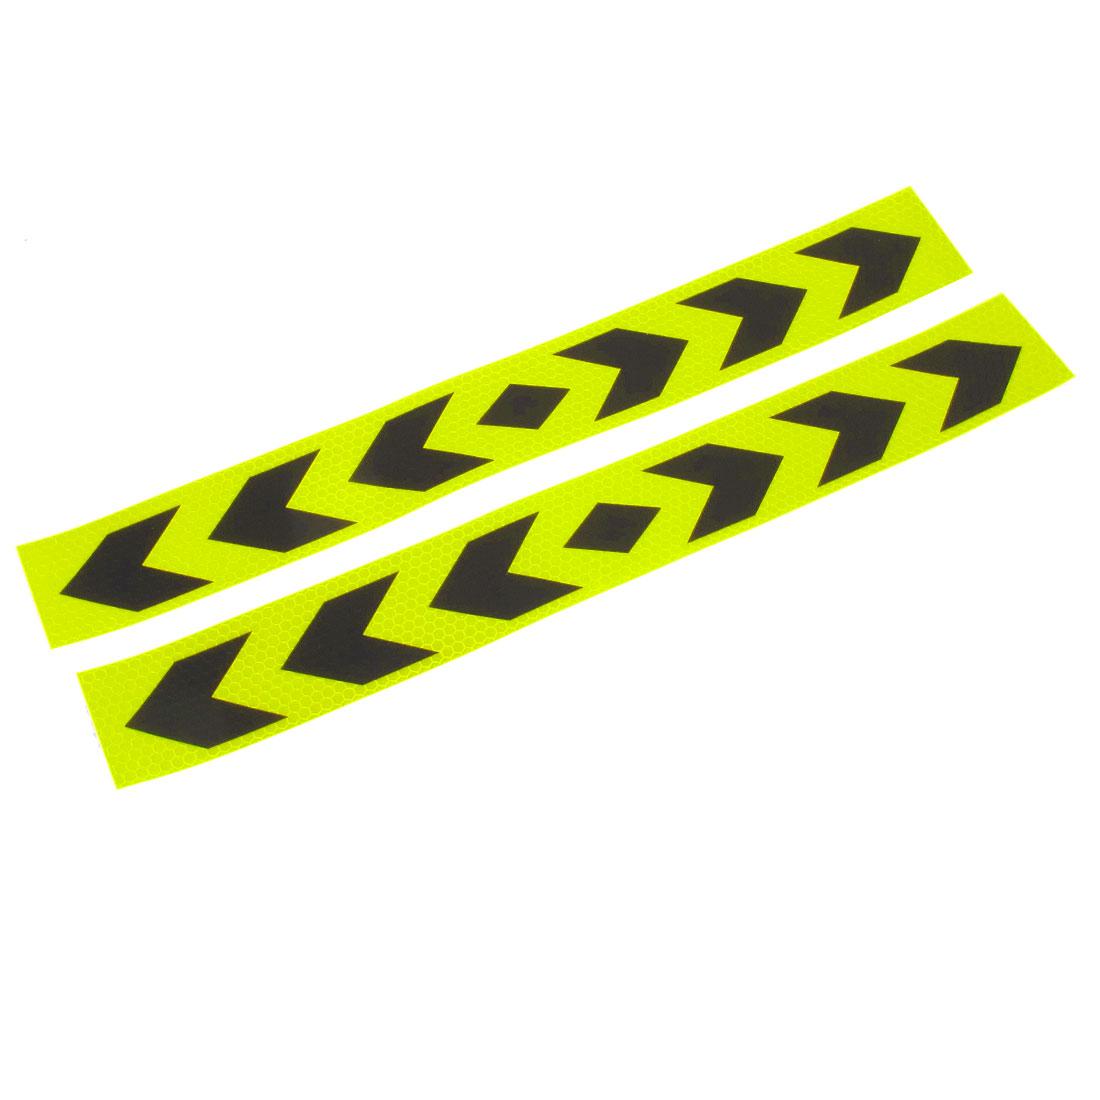 2 Pcs Reflective Arrow Pattern Sticker Yellow Black 40cm Long for Car